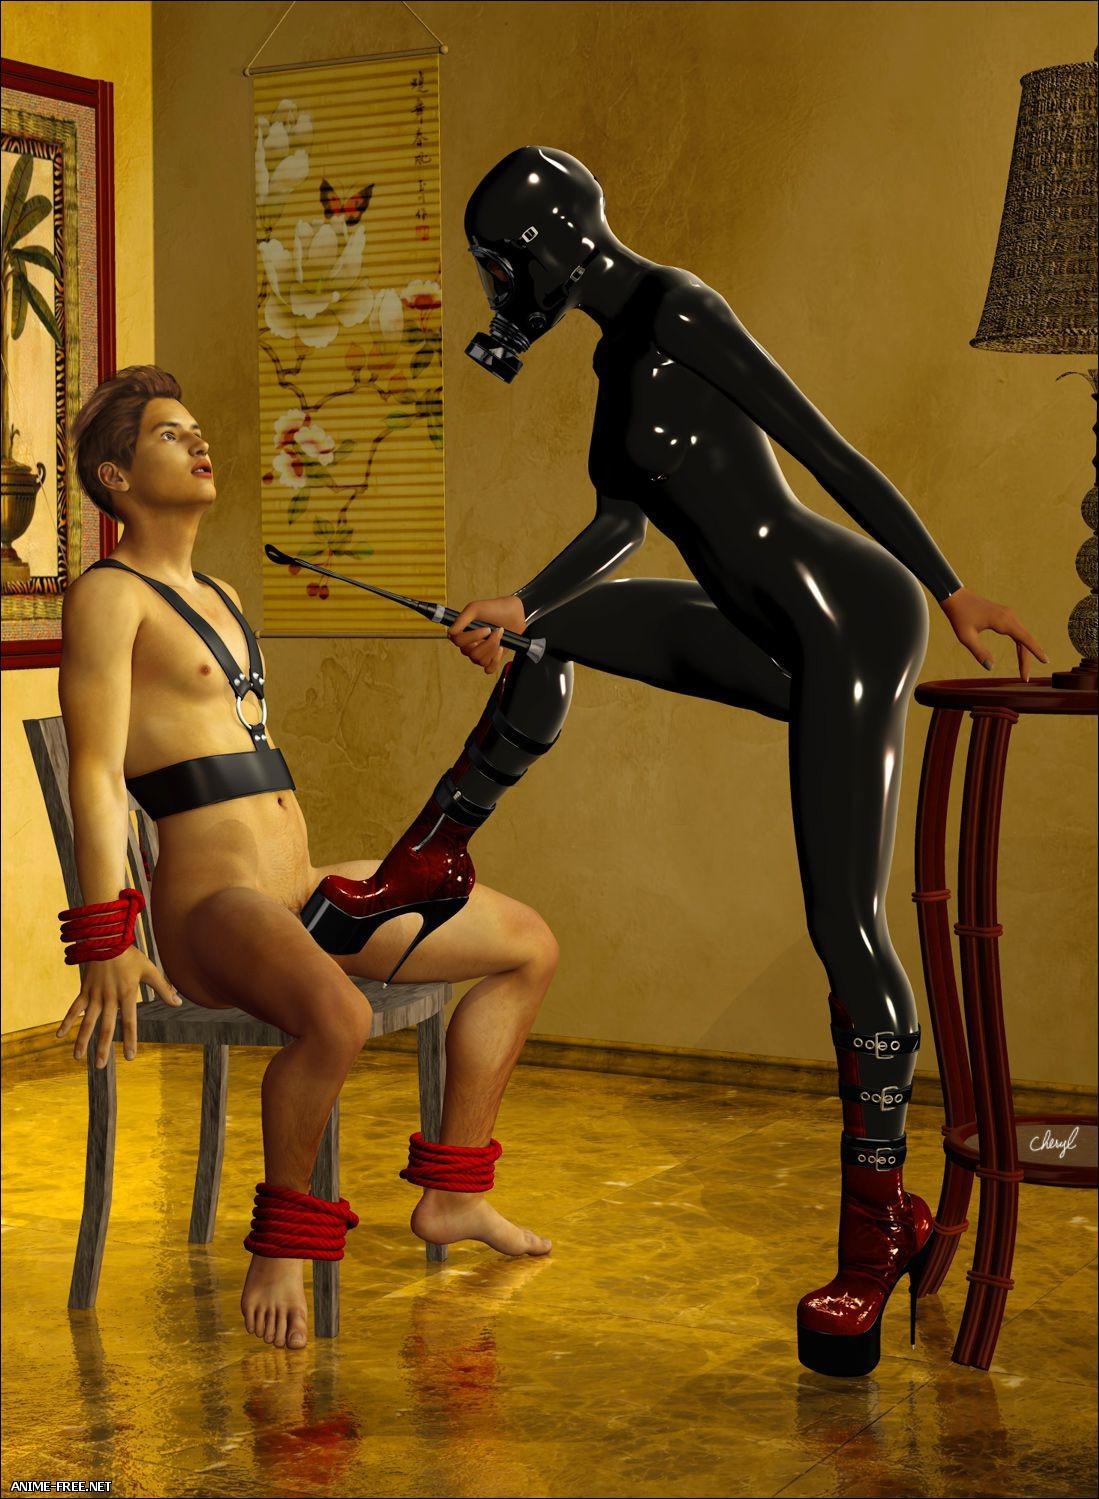 femdom-digital-art-4-2